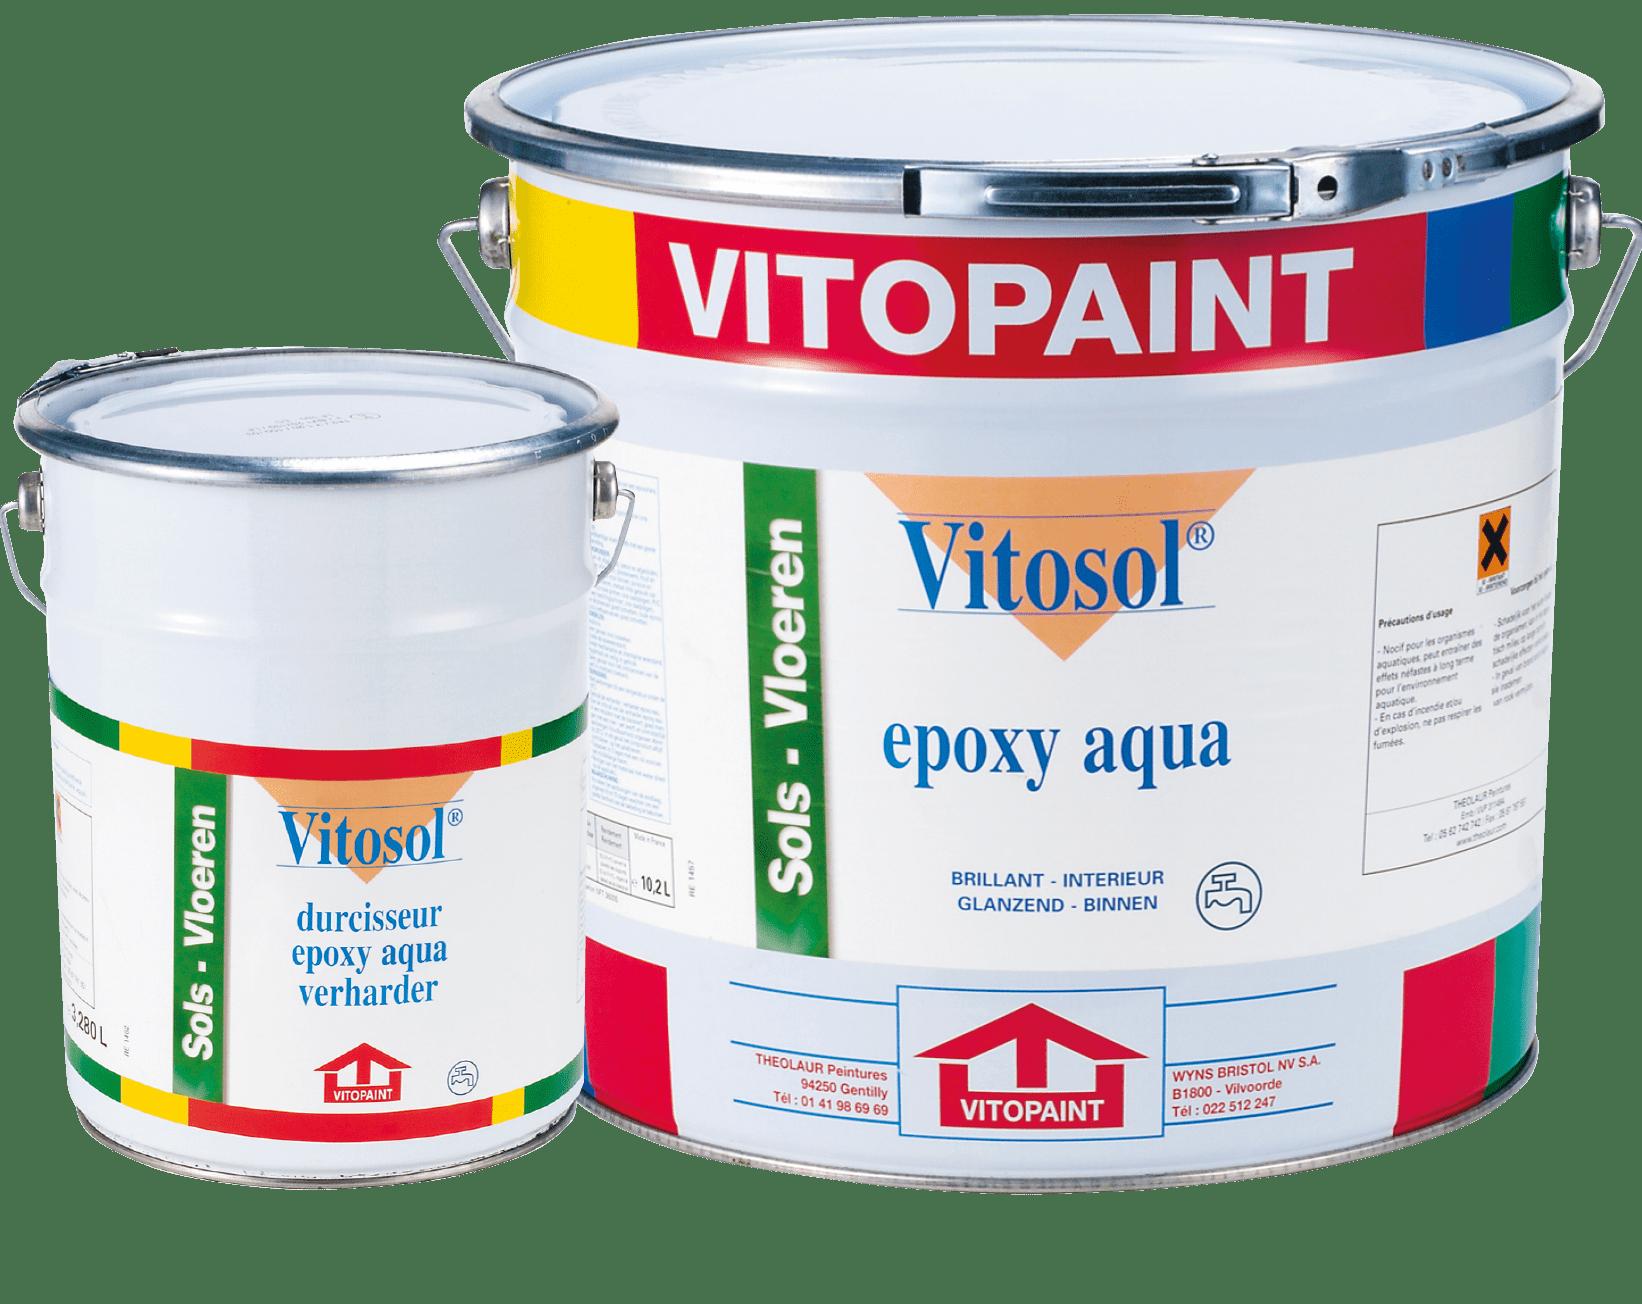 Vitosol Epoxy Aqua